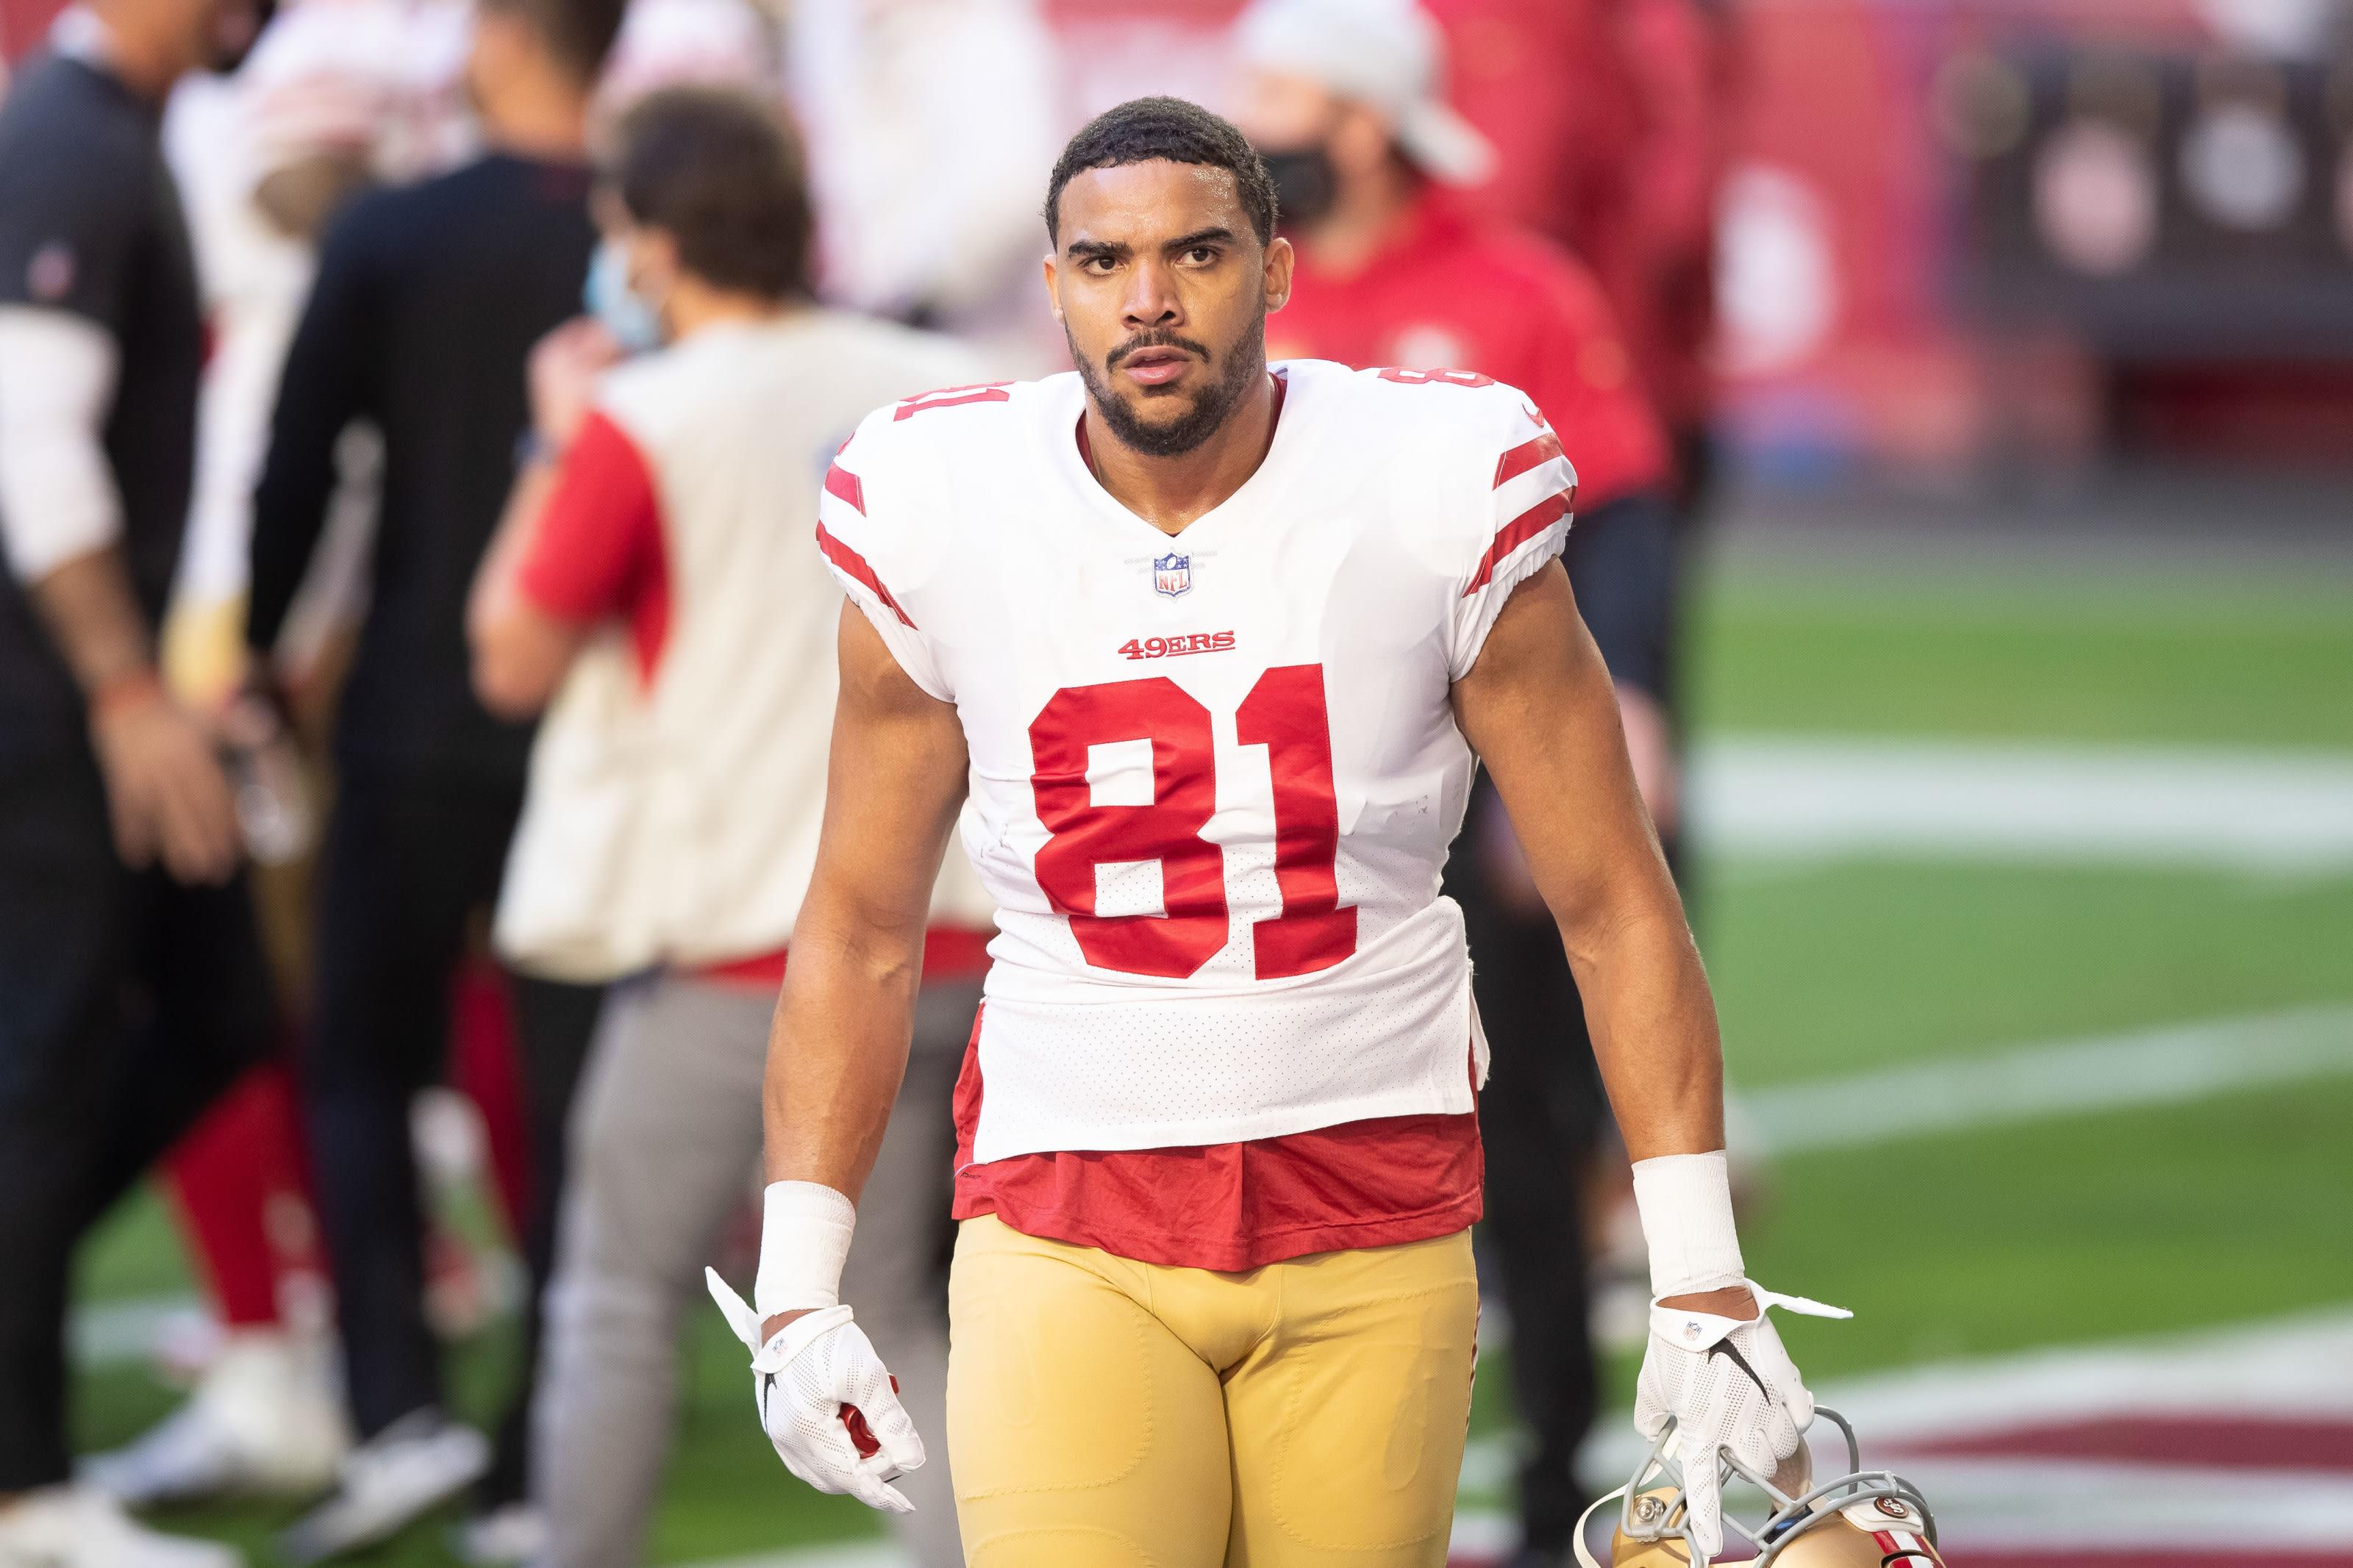 Jordan Reed, SF 49ers